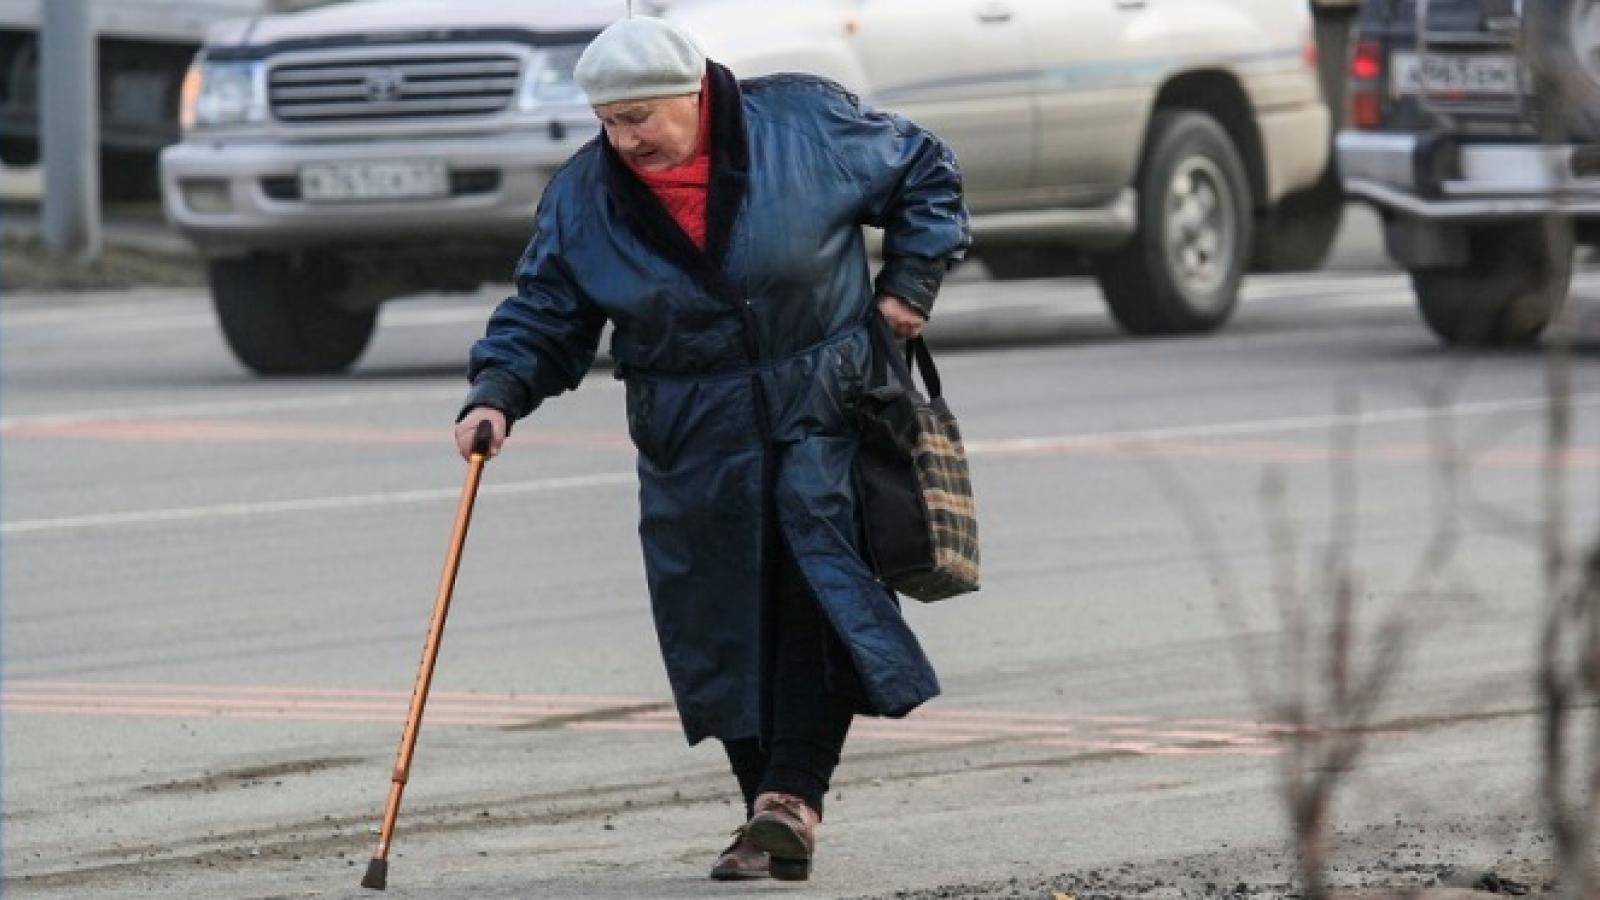 Вологжанин не заметил и сбил пенсионерку